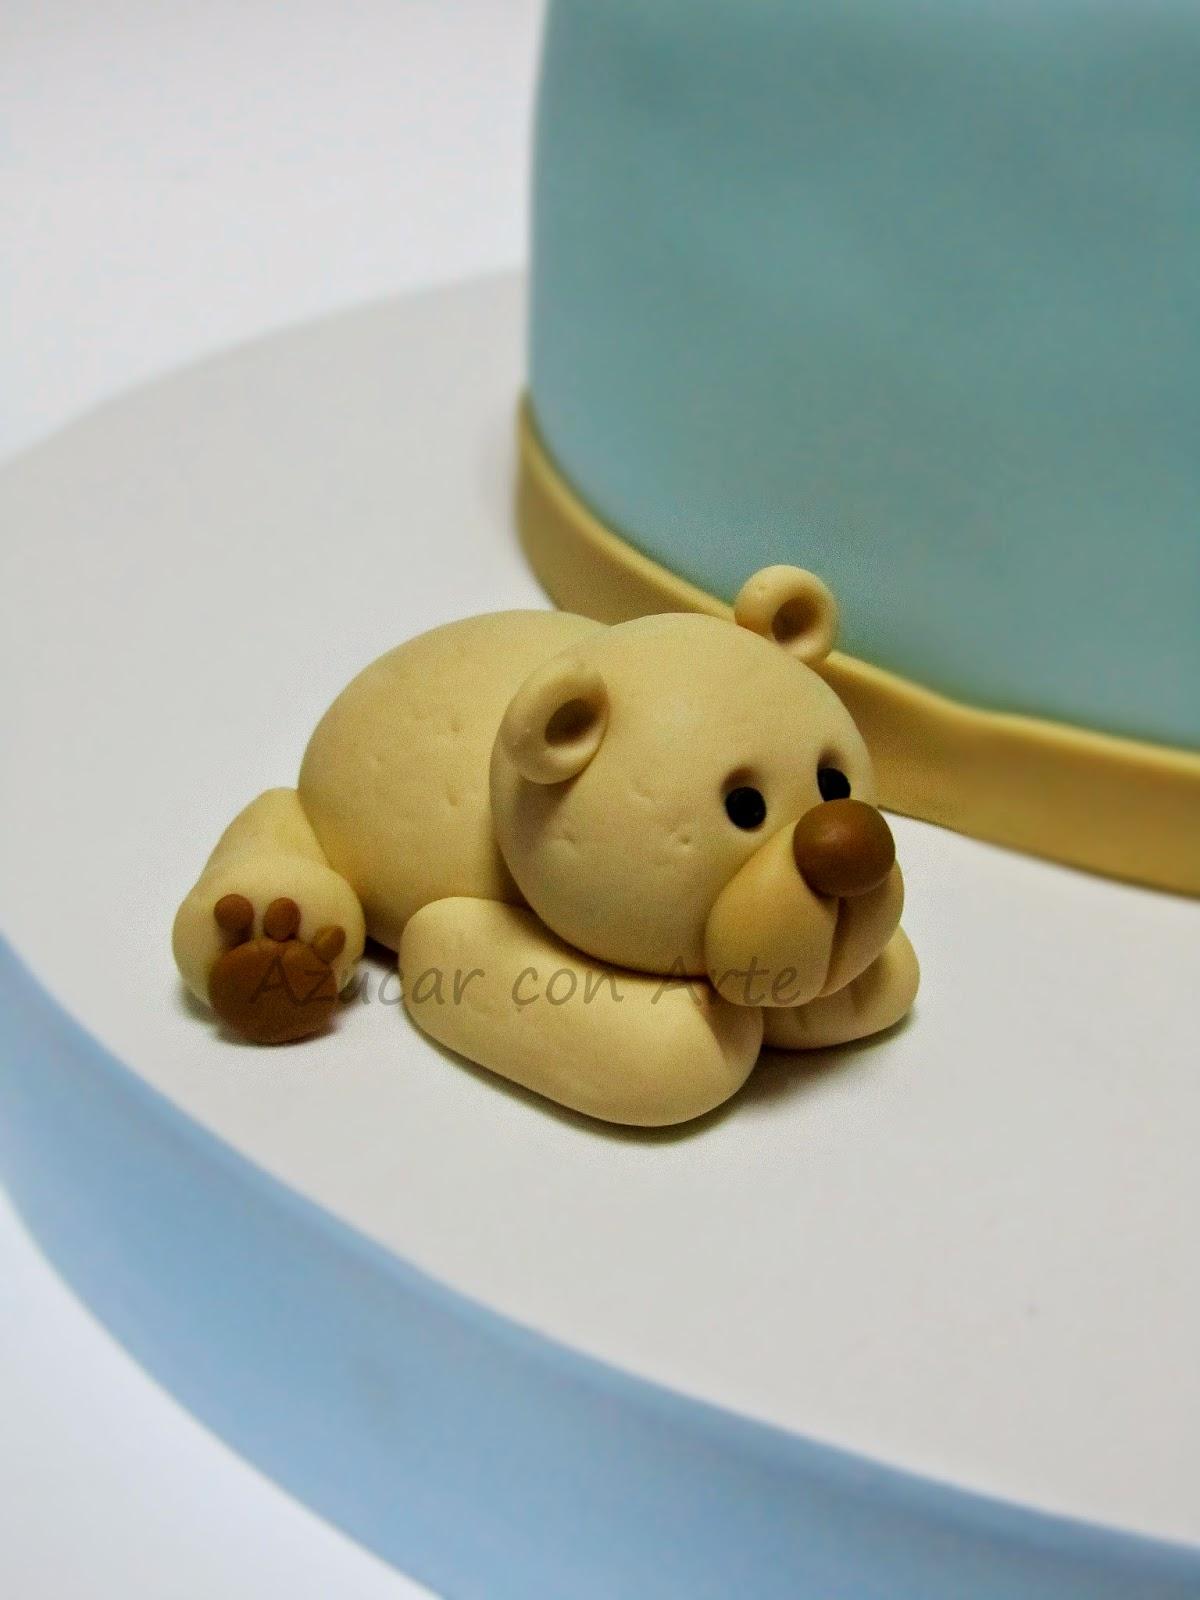 fondant bear | azucar con arte